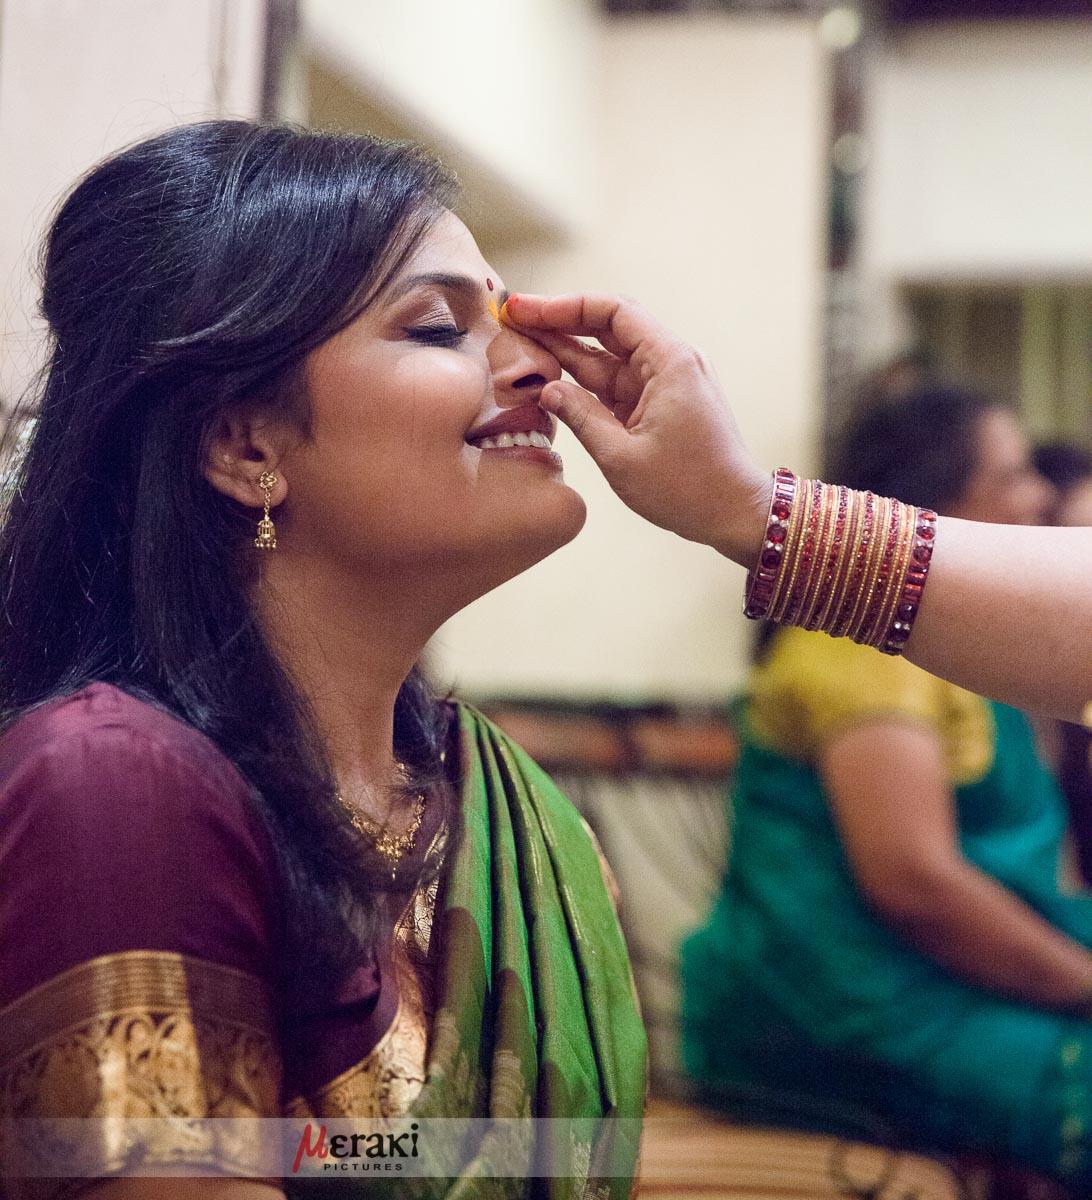 009-_MG_6749-maithili-ajinkya-engagement-portfolio